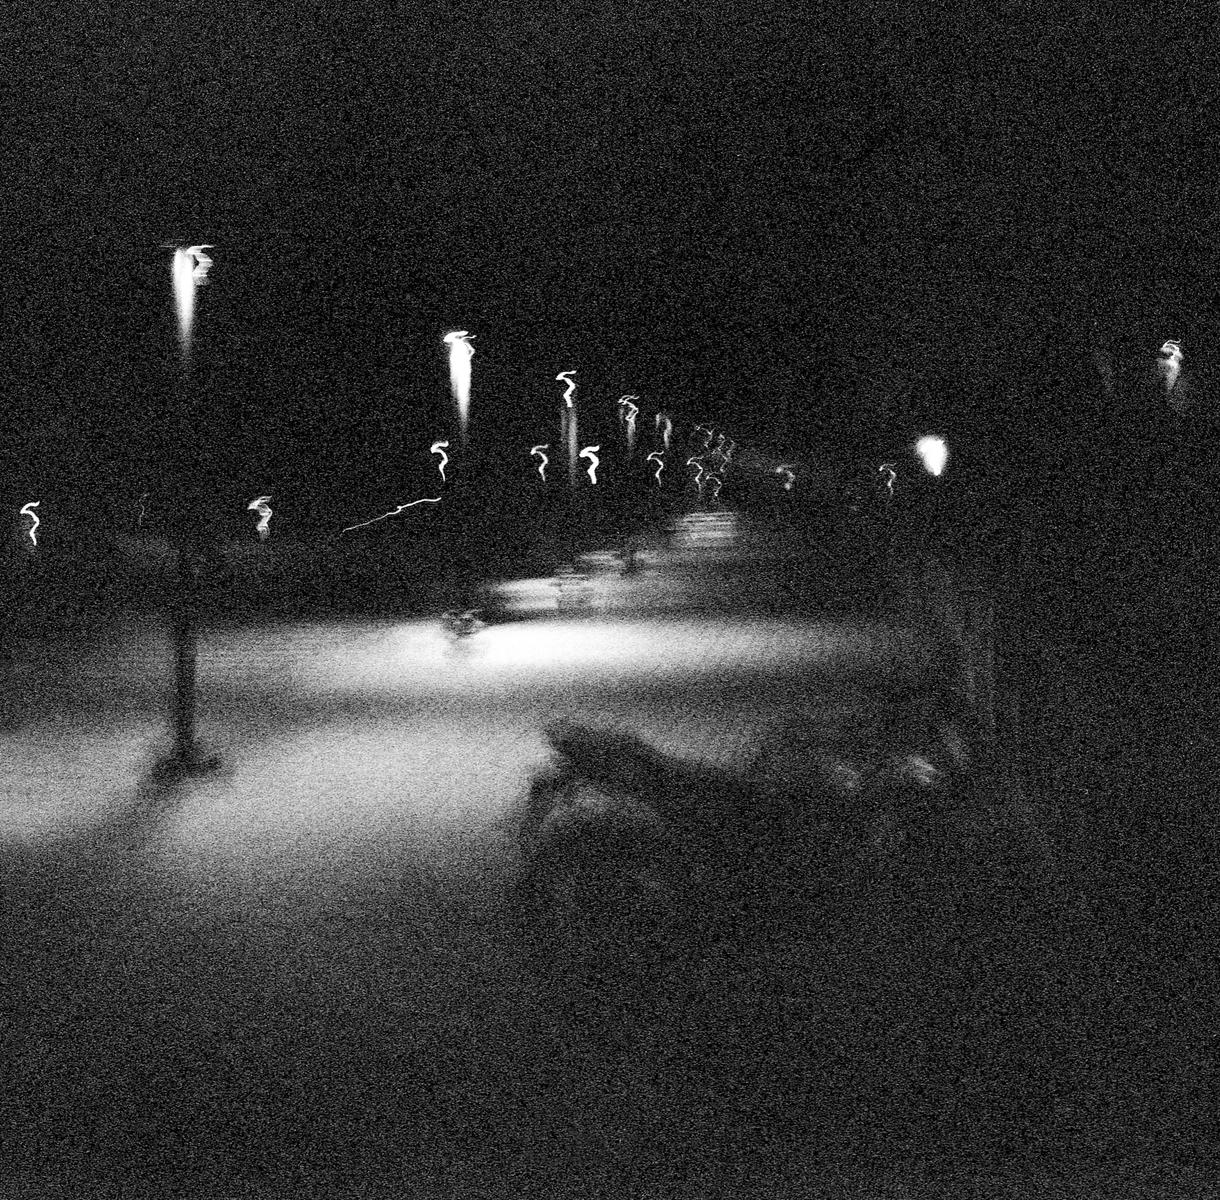 Lamp Posts and a Motorcycle, Raichak 2015   Edition 1 of 2